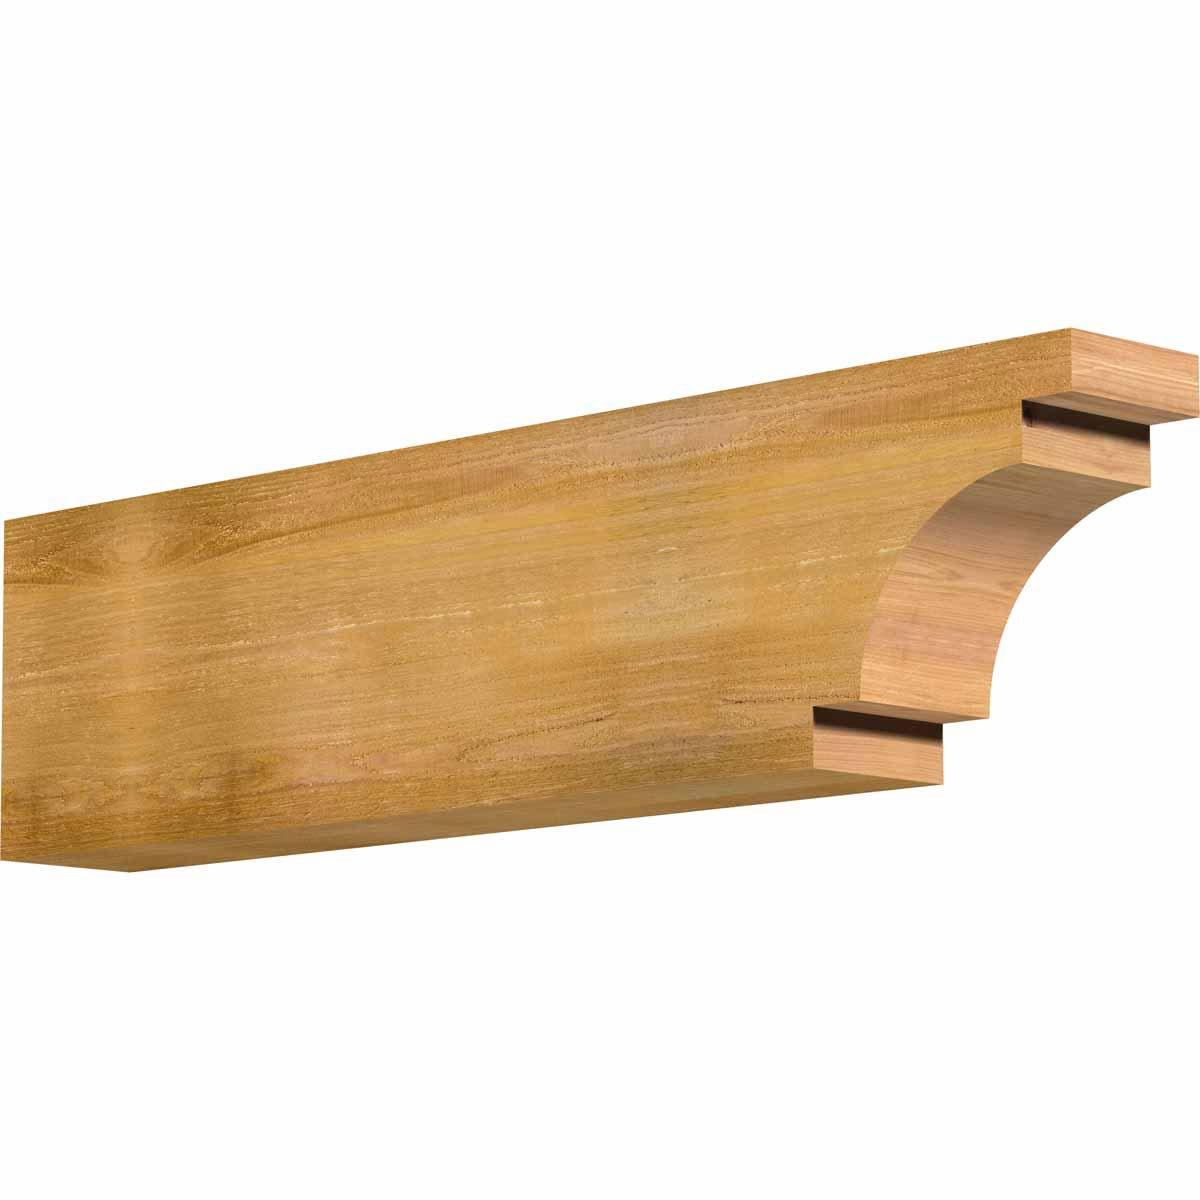 Ekena Millwork RFT06X12X48MED00RWR Mediterranean Rough Sawn Rafter Tail, 6'' Width by 12'' Height by 48'' Length, Western Red Cedar